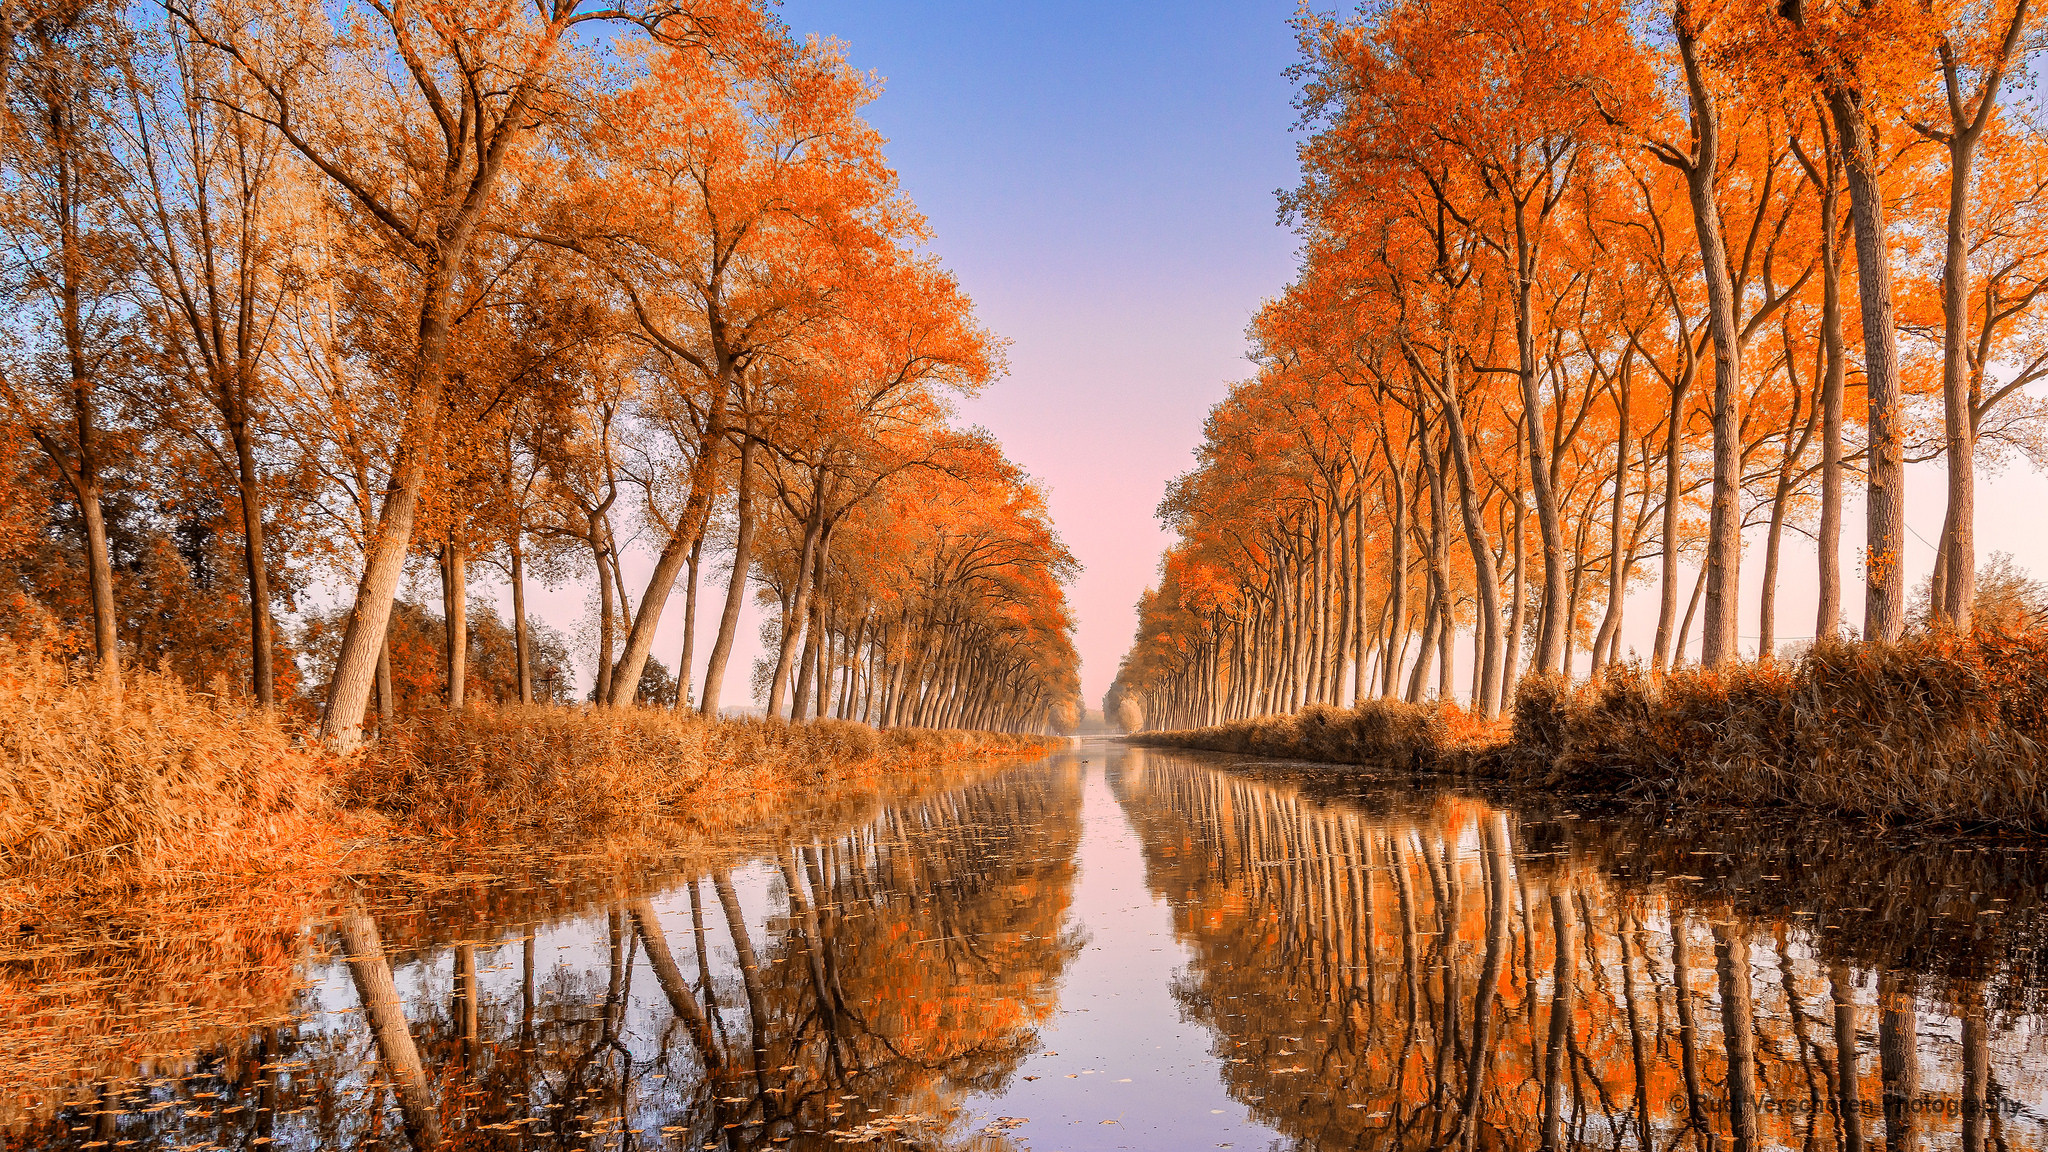 обои осень, река, канал, деревья картинки фото